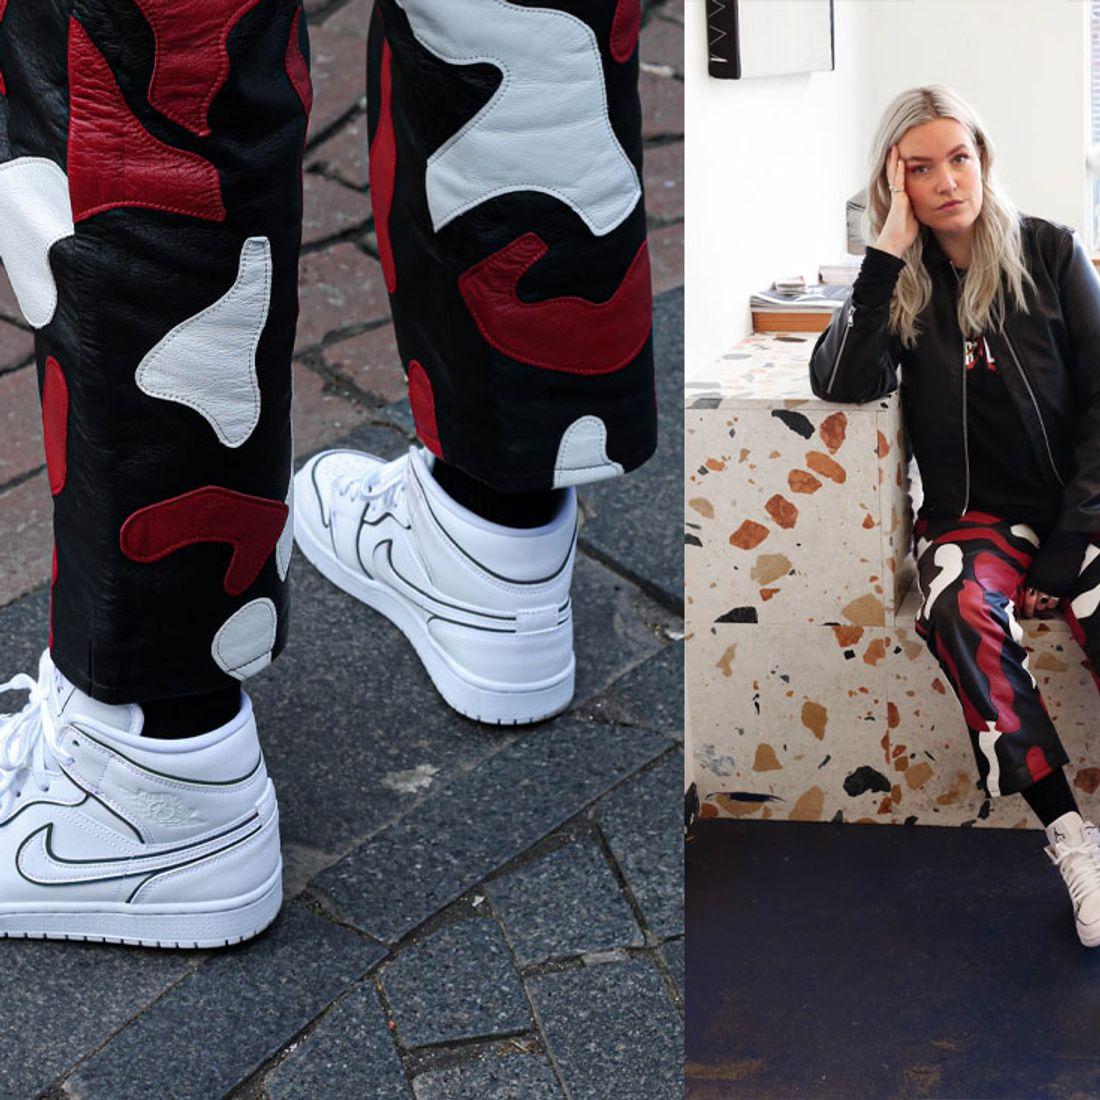 Desgracia acelerador insuficiente  Hit Amsterdam in the Air Jordan 1 with Girl on Kicks and SNIPES! - Sneaker  Freaker